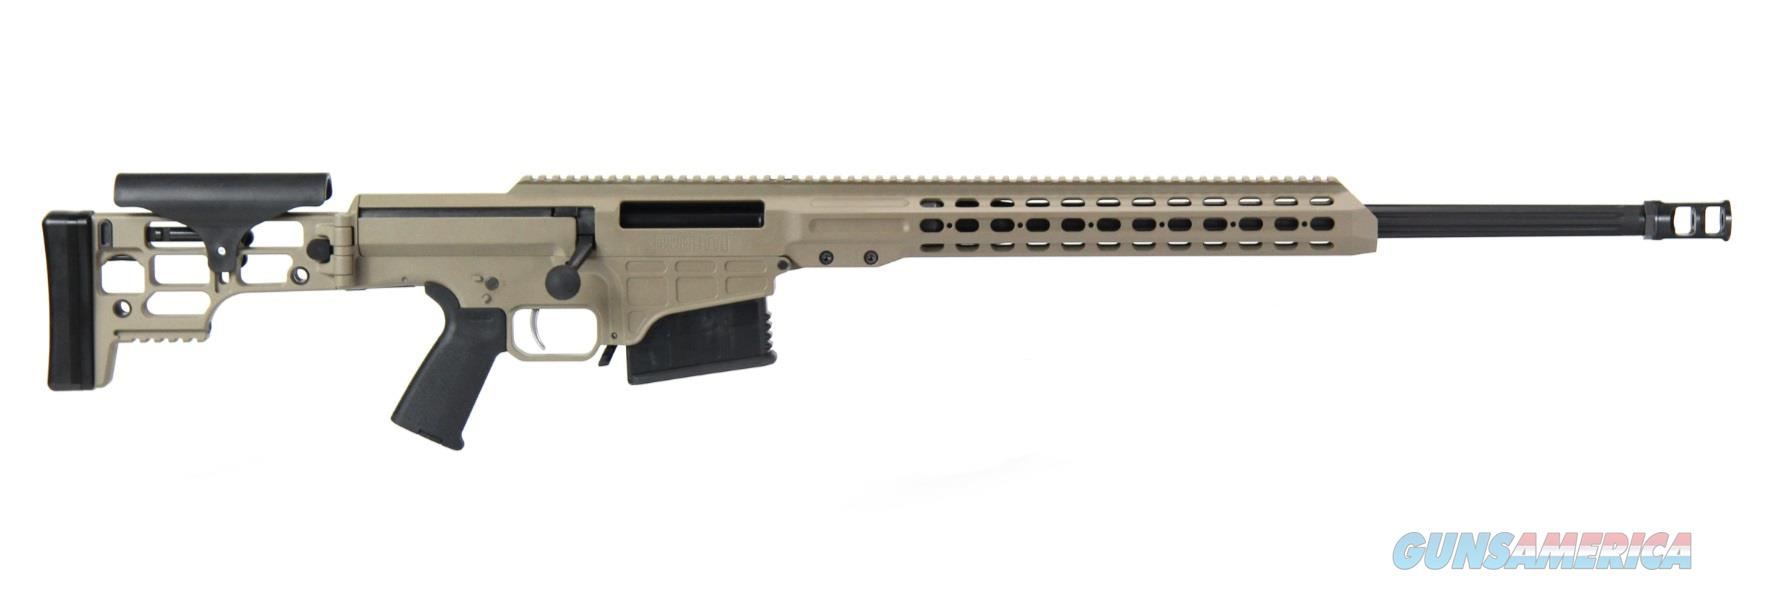 "Mrad 338Lap Fde 26"" 10+1 14376  Guns > Rifles > Barrett Rifles"